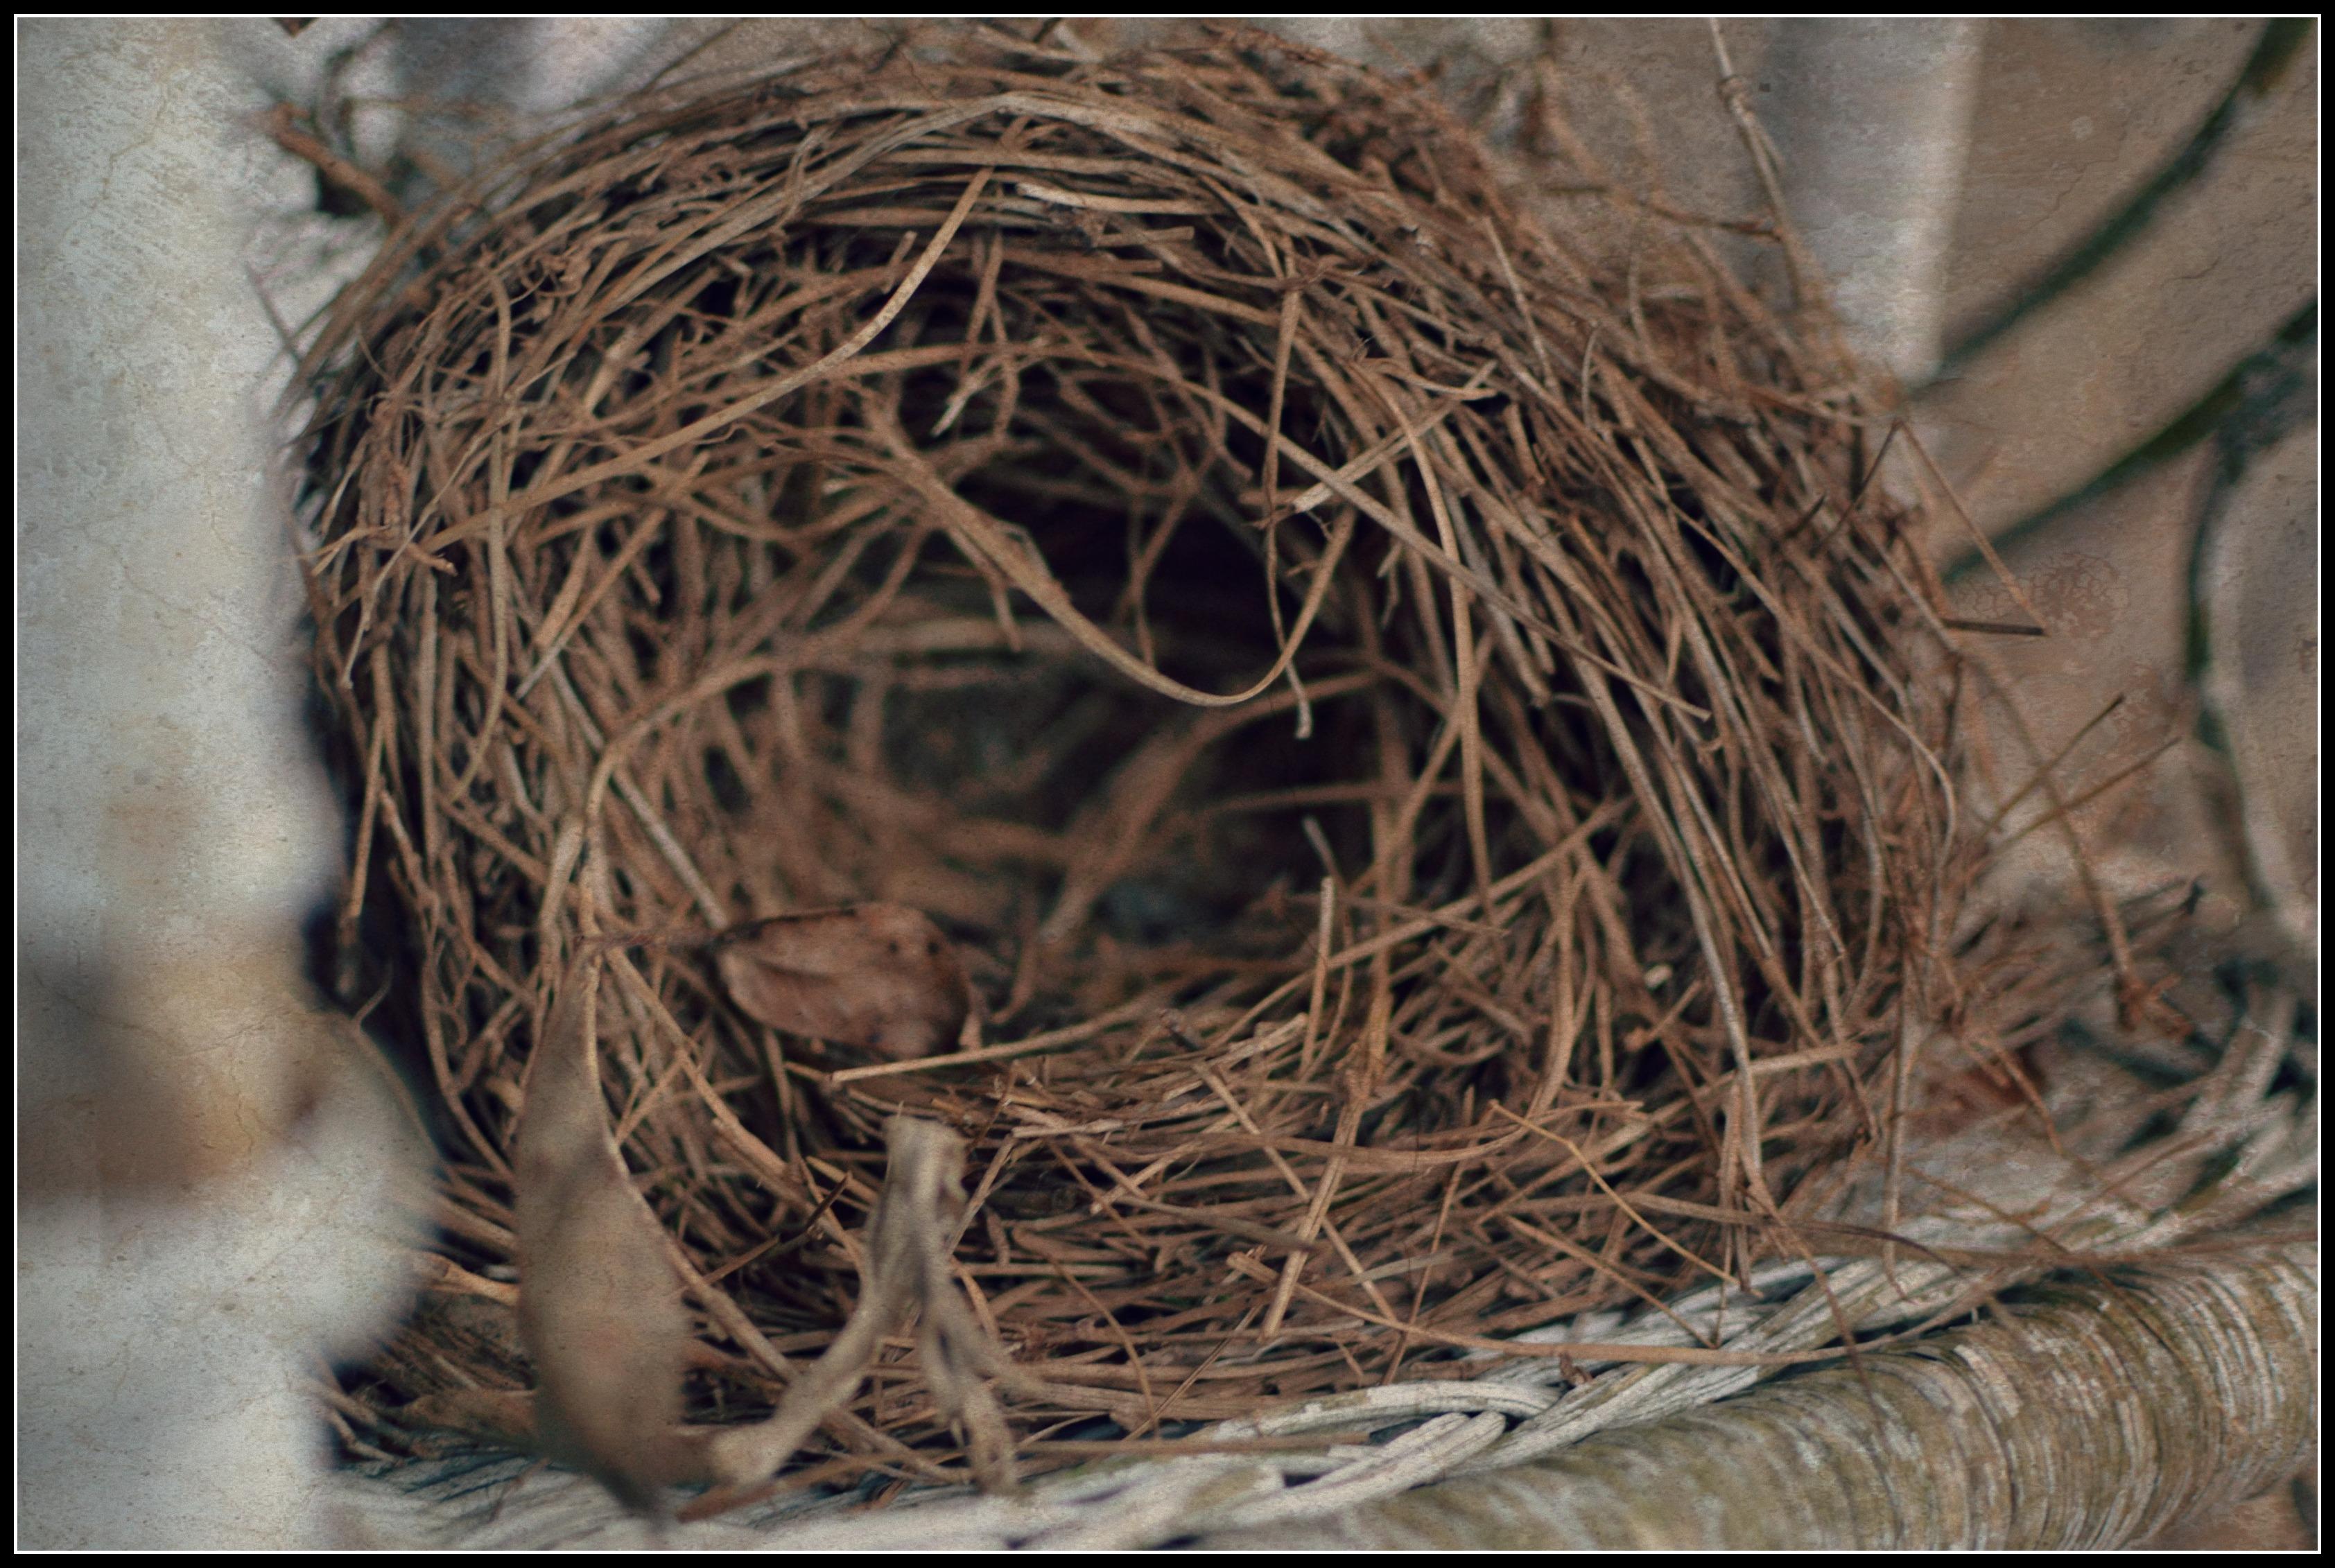 pine straw nest